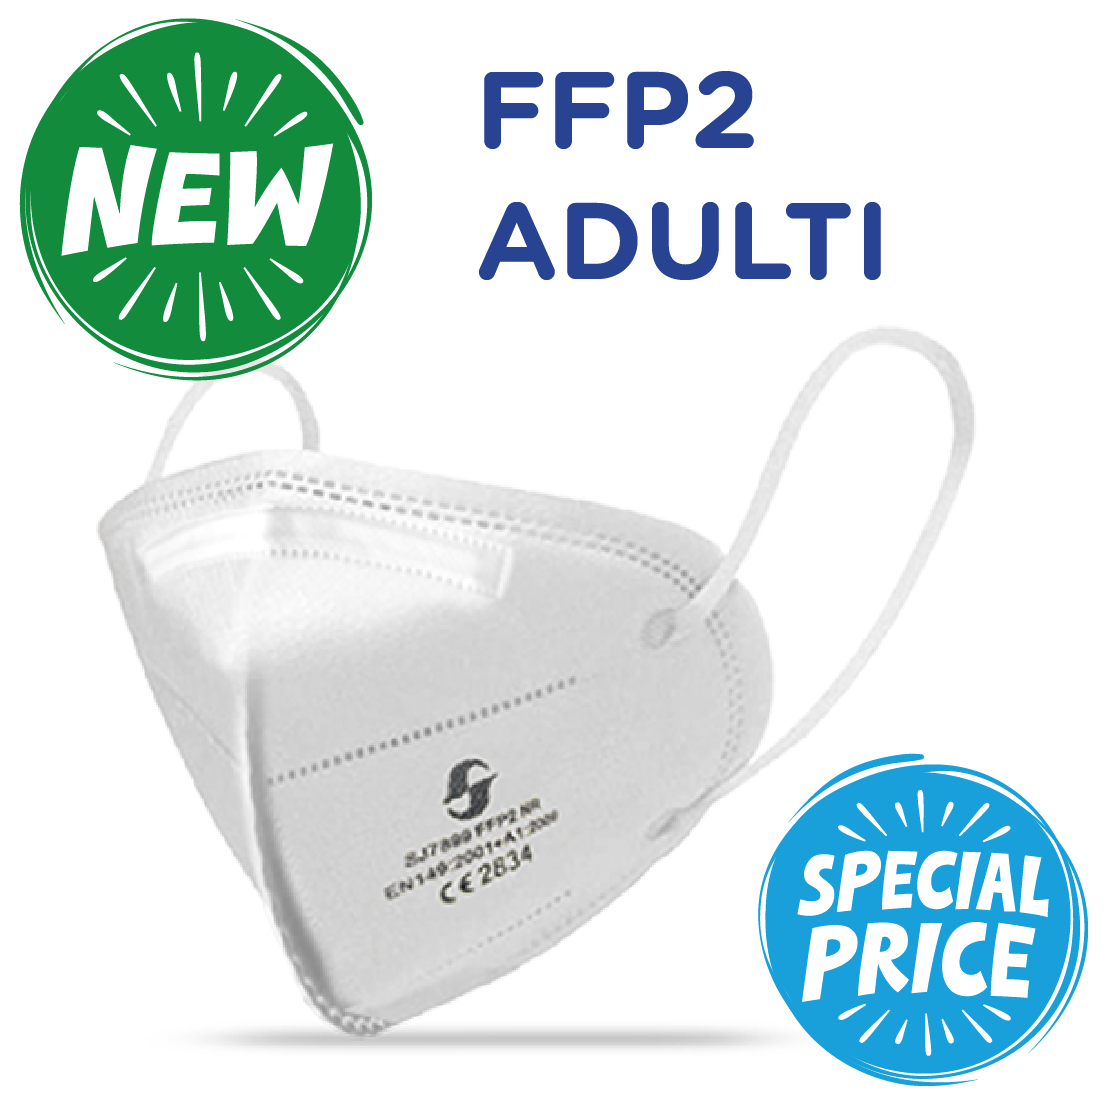 art. FFP270 _ FFP2 CERTIFICATA CE 200 PZ - OFFERTA LAST MINUTE (0,71 cad)